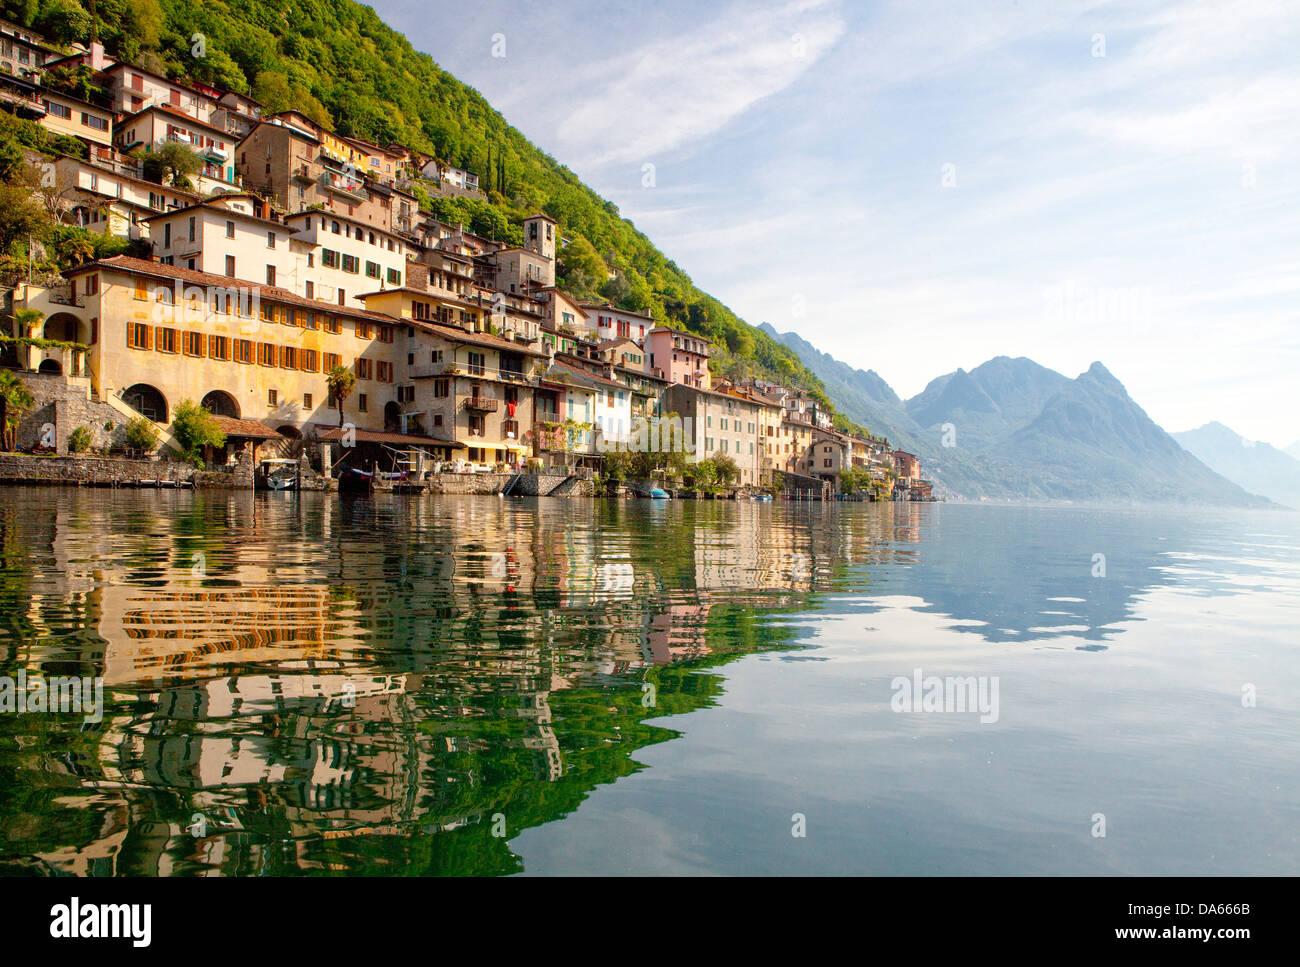 Gandria, canton, TI, Ticino, South Switzerland, water, lake, lakes, village, Switzerland, Europe, Lake Lugano, - Stock Image